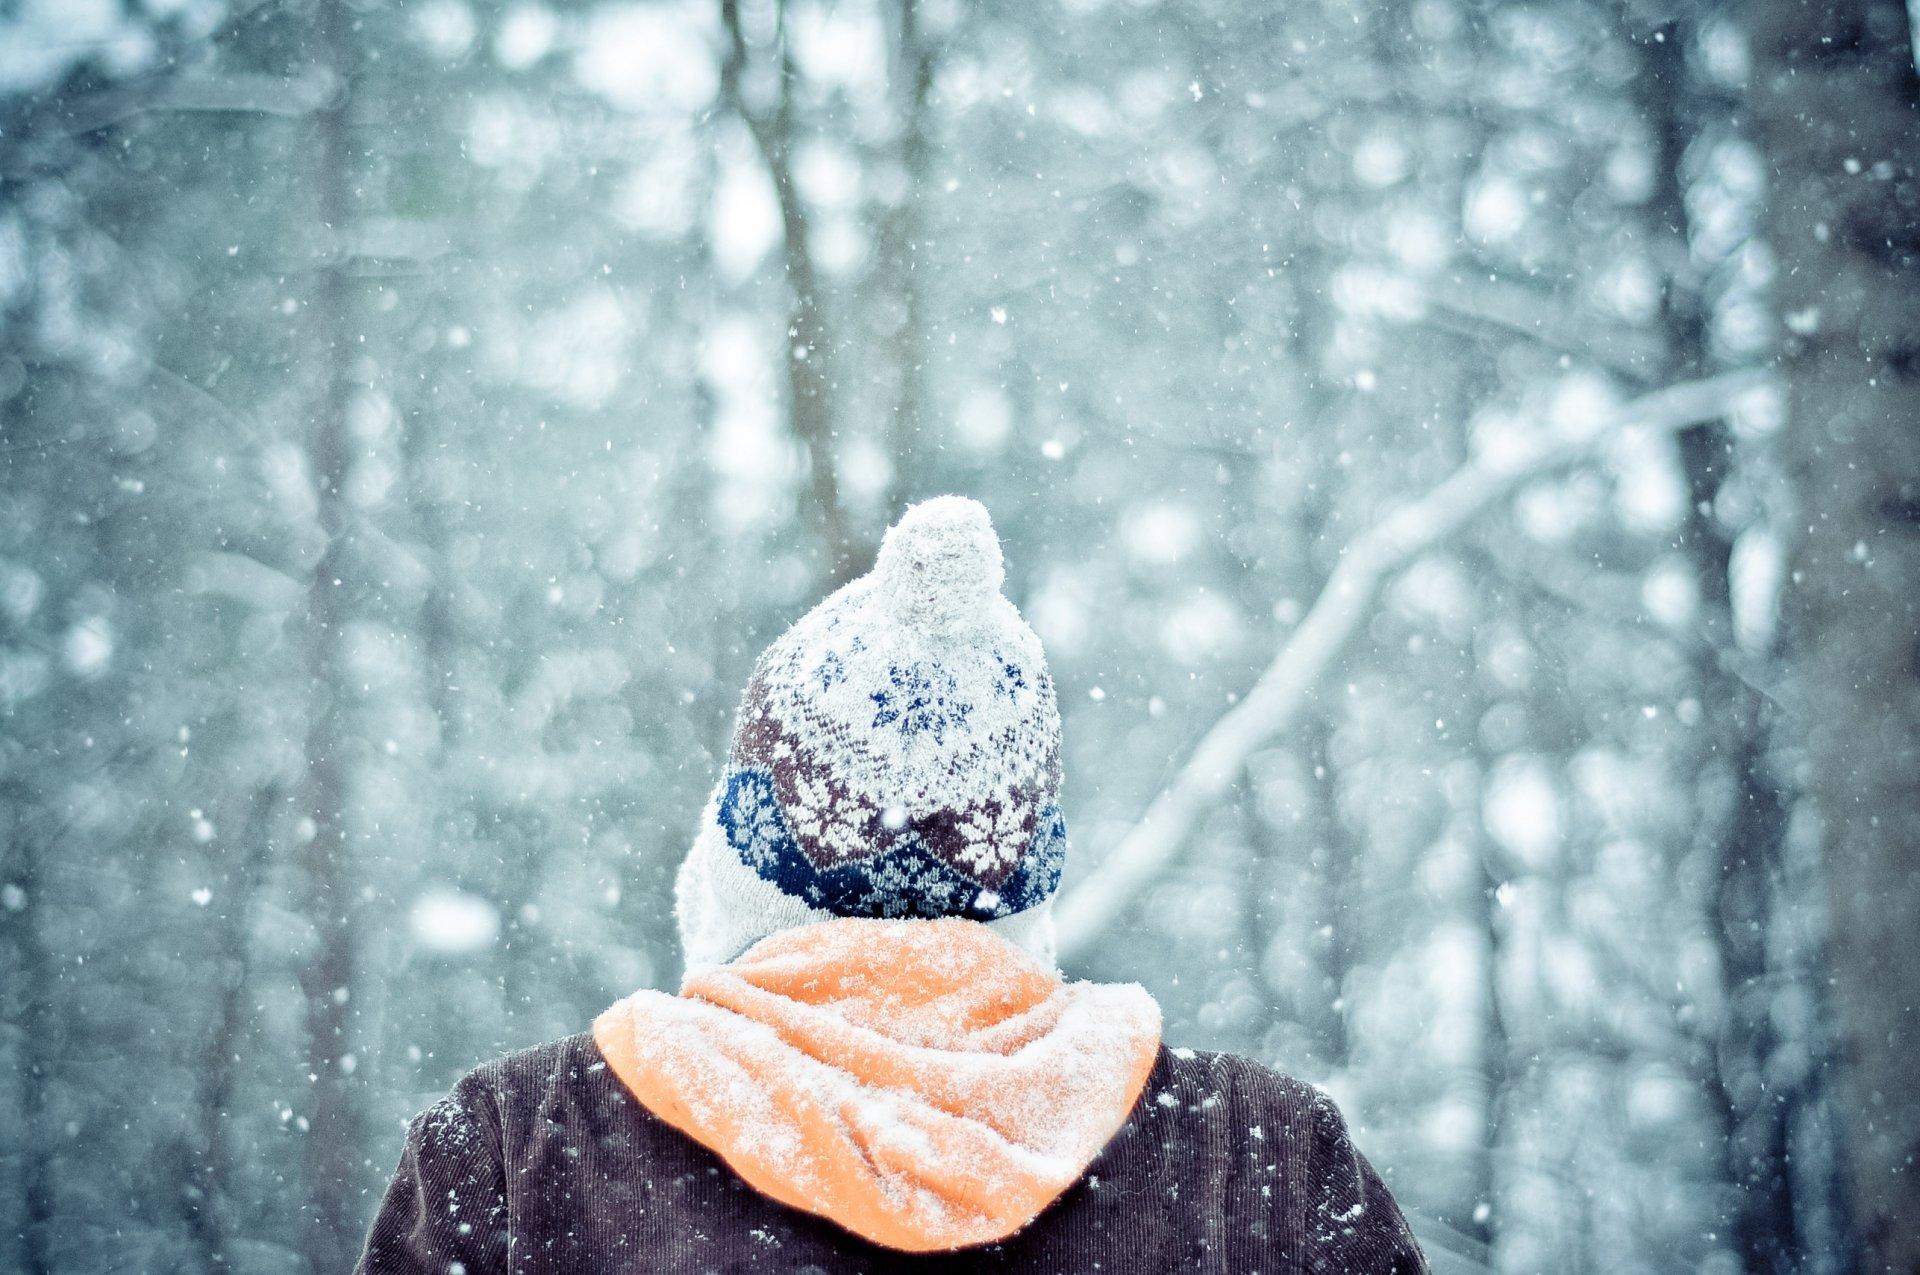 Фото девушки фото сзади на аву зимой с